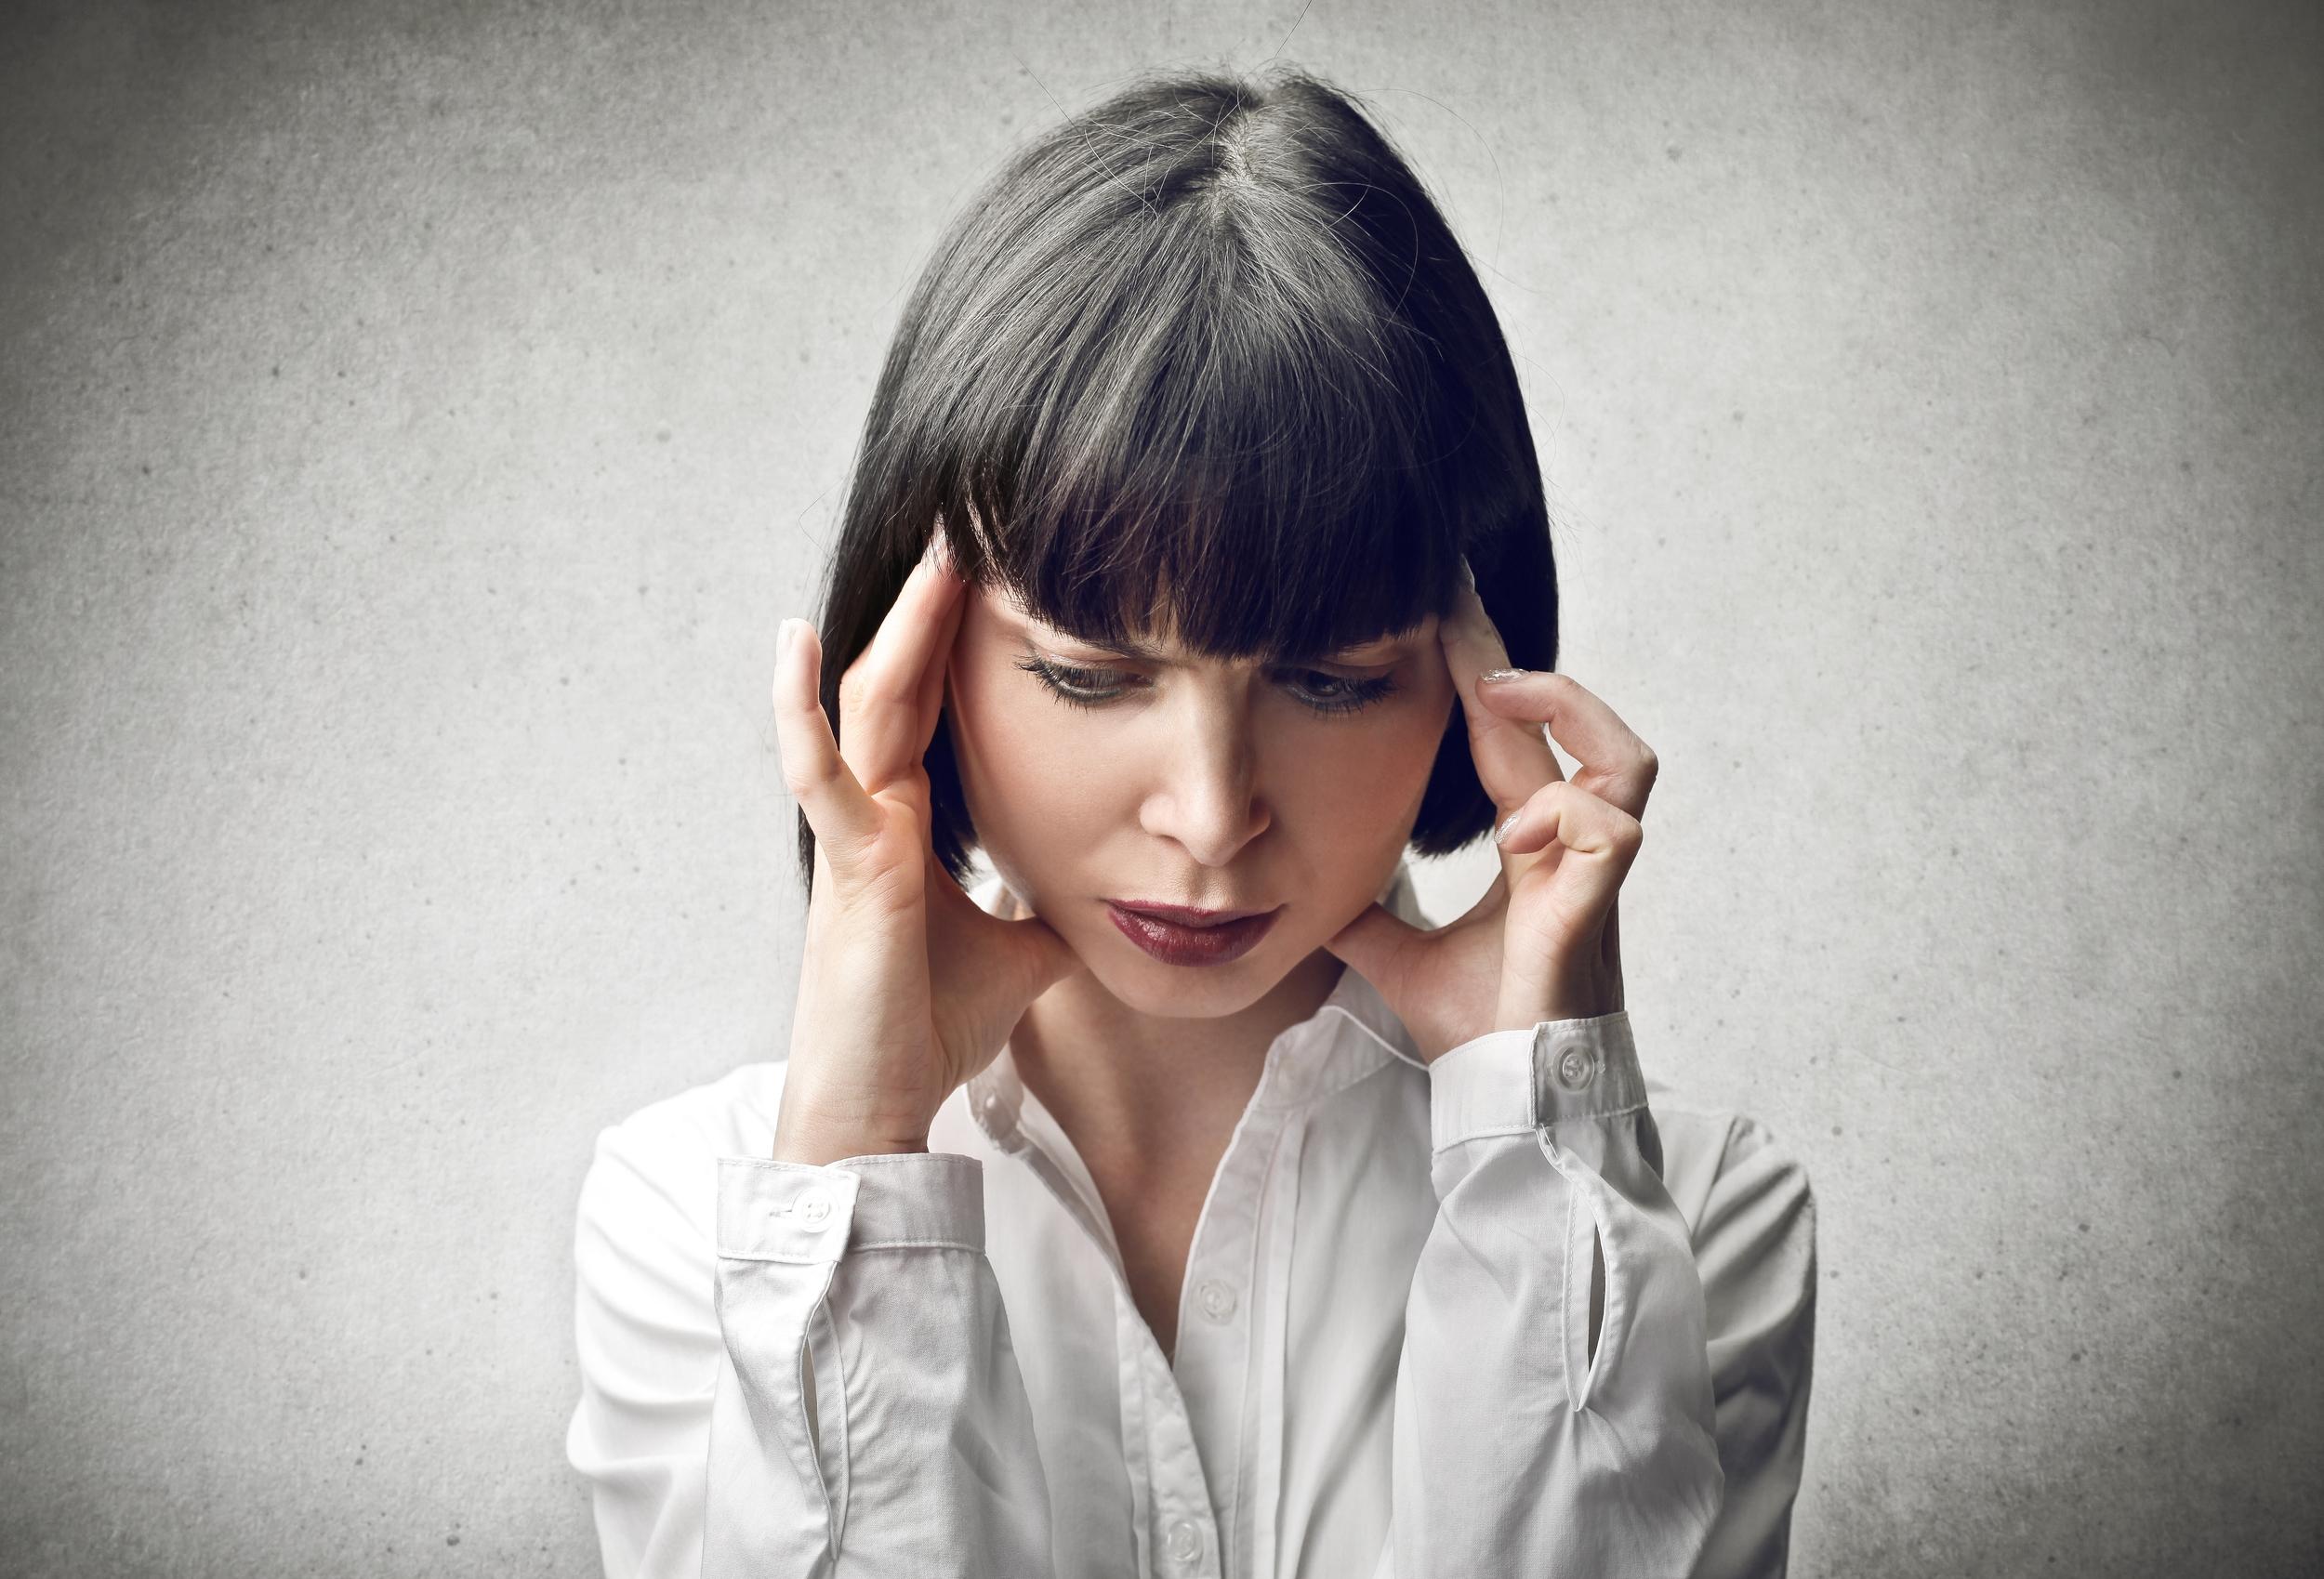 anxiety-mood-disorders